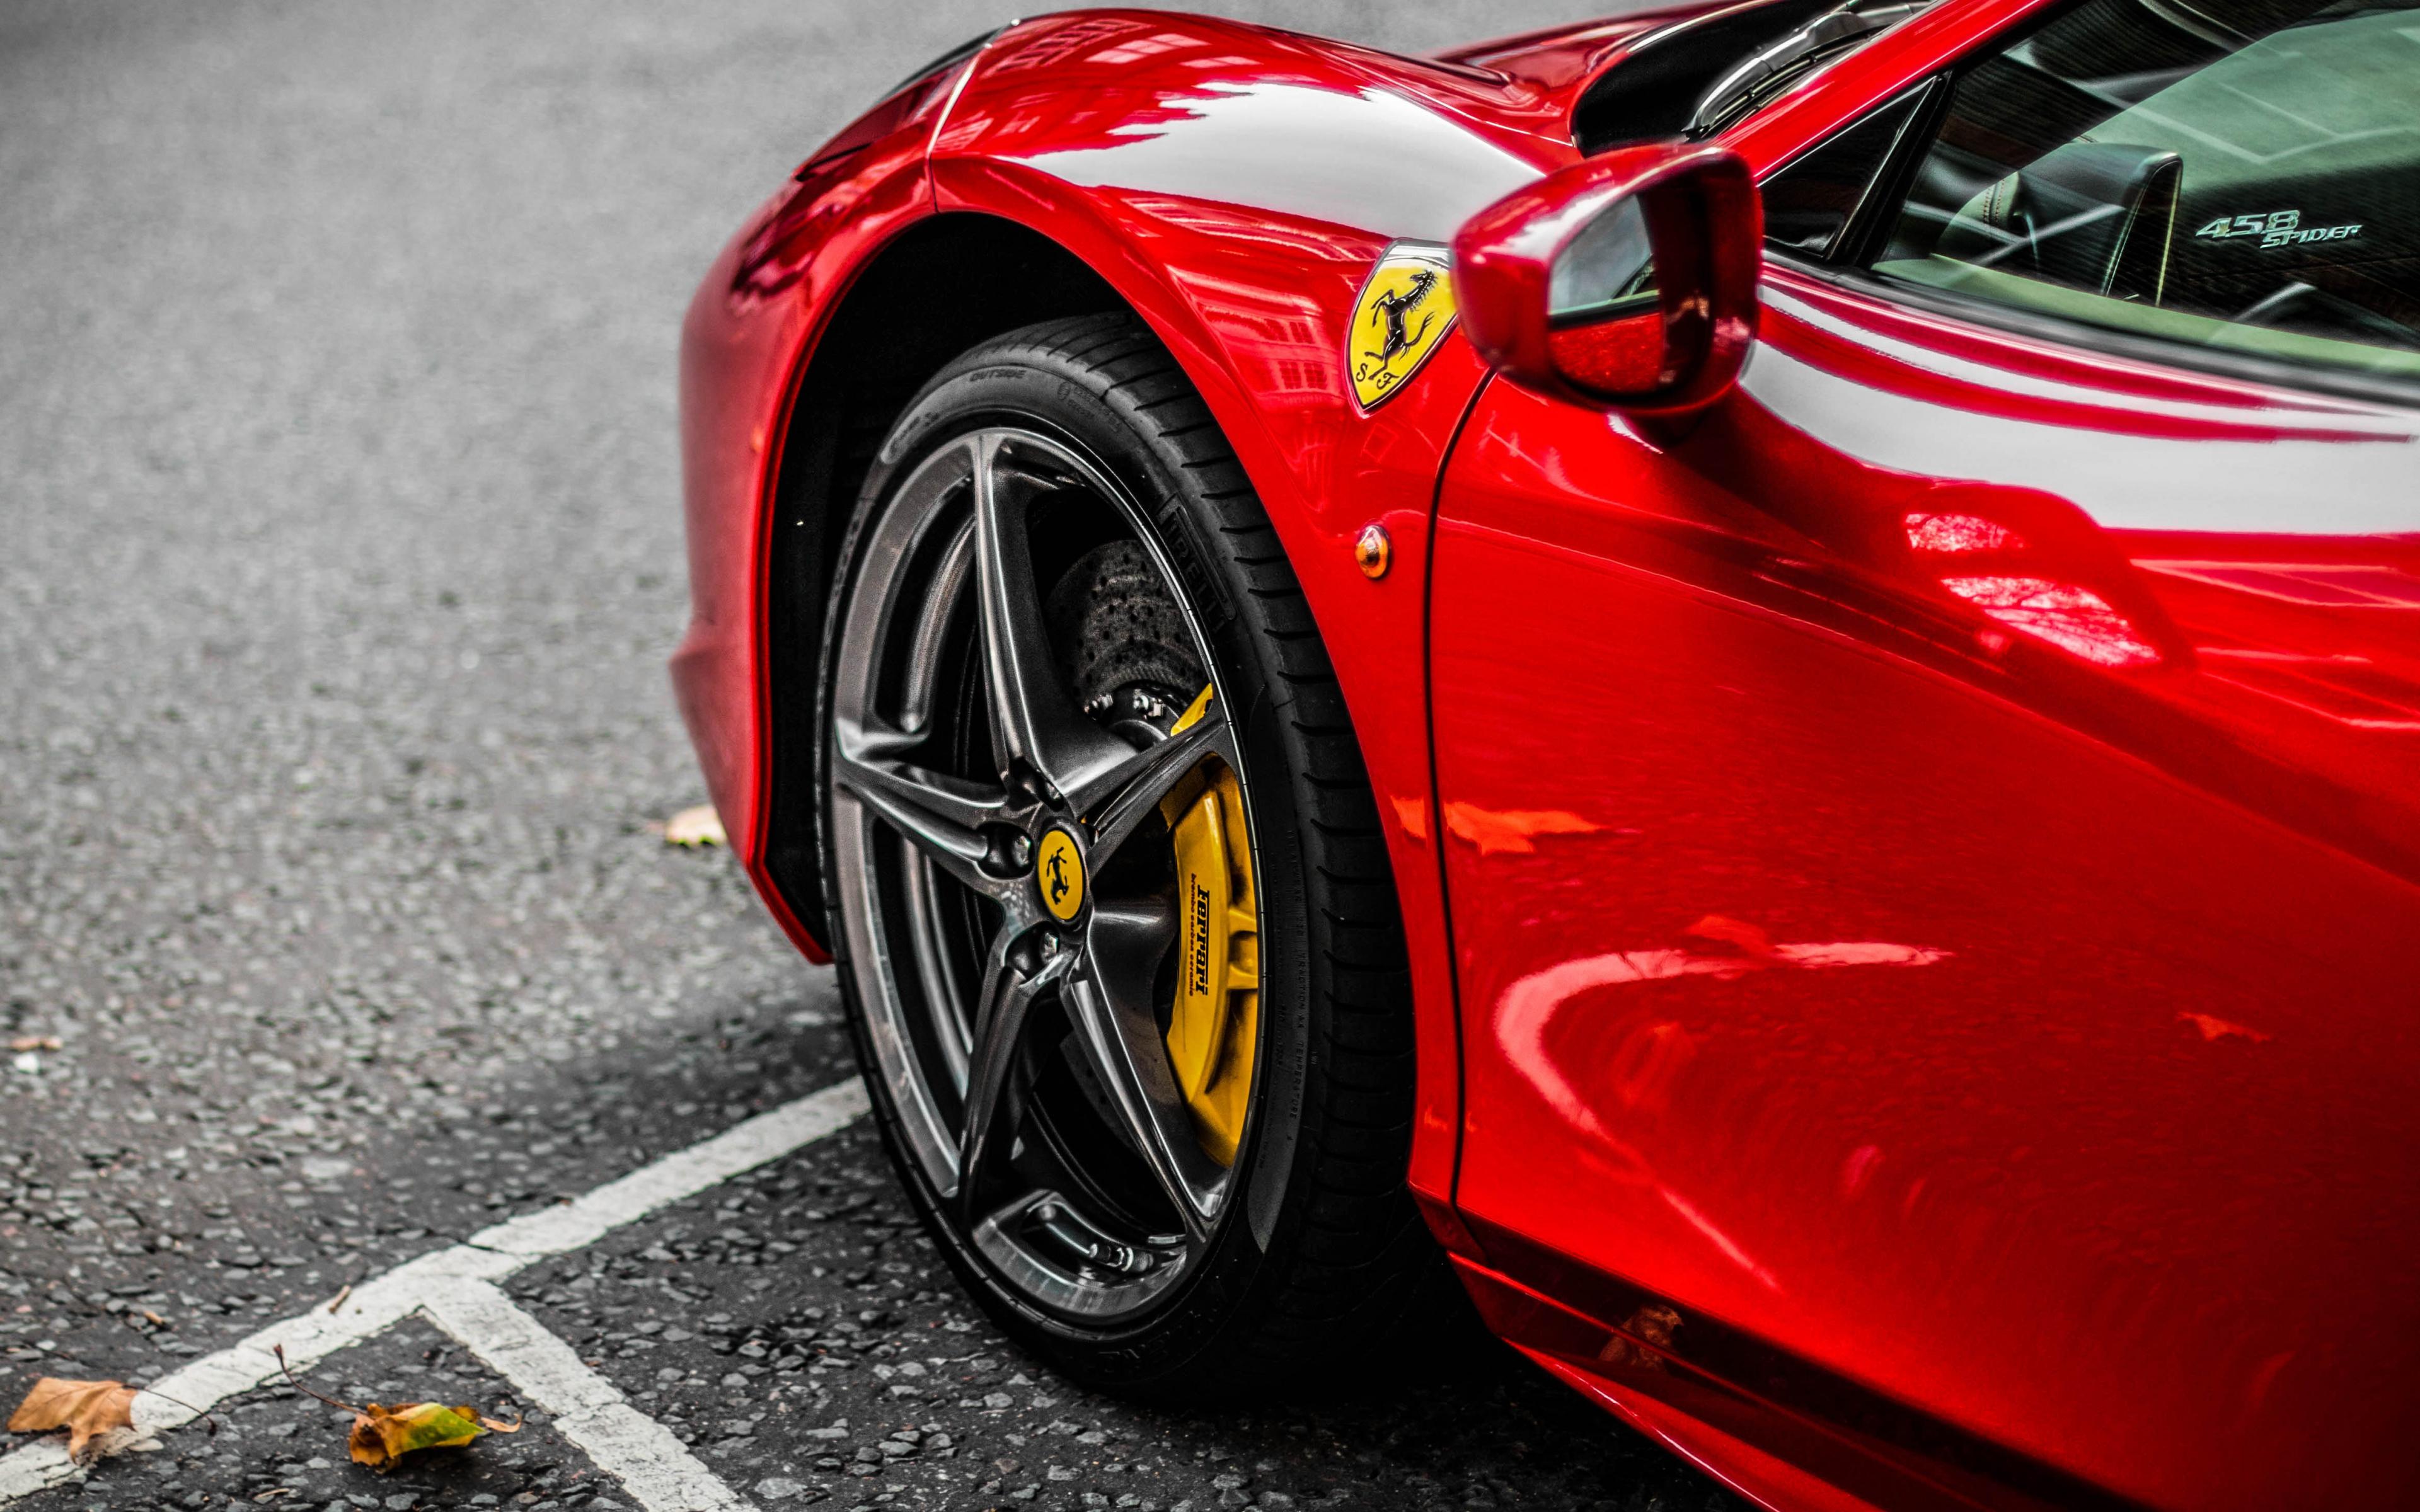 Download 3840x2400 Wallpaper Red Supercar, Ferrari, Wheel, 4k, 4 K, Ultra Hd 16:10, Widescreen